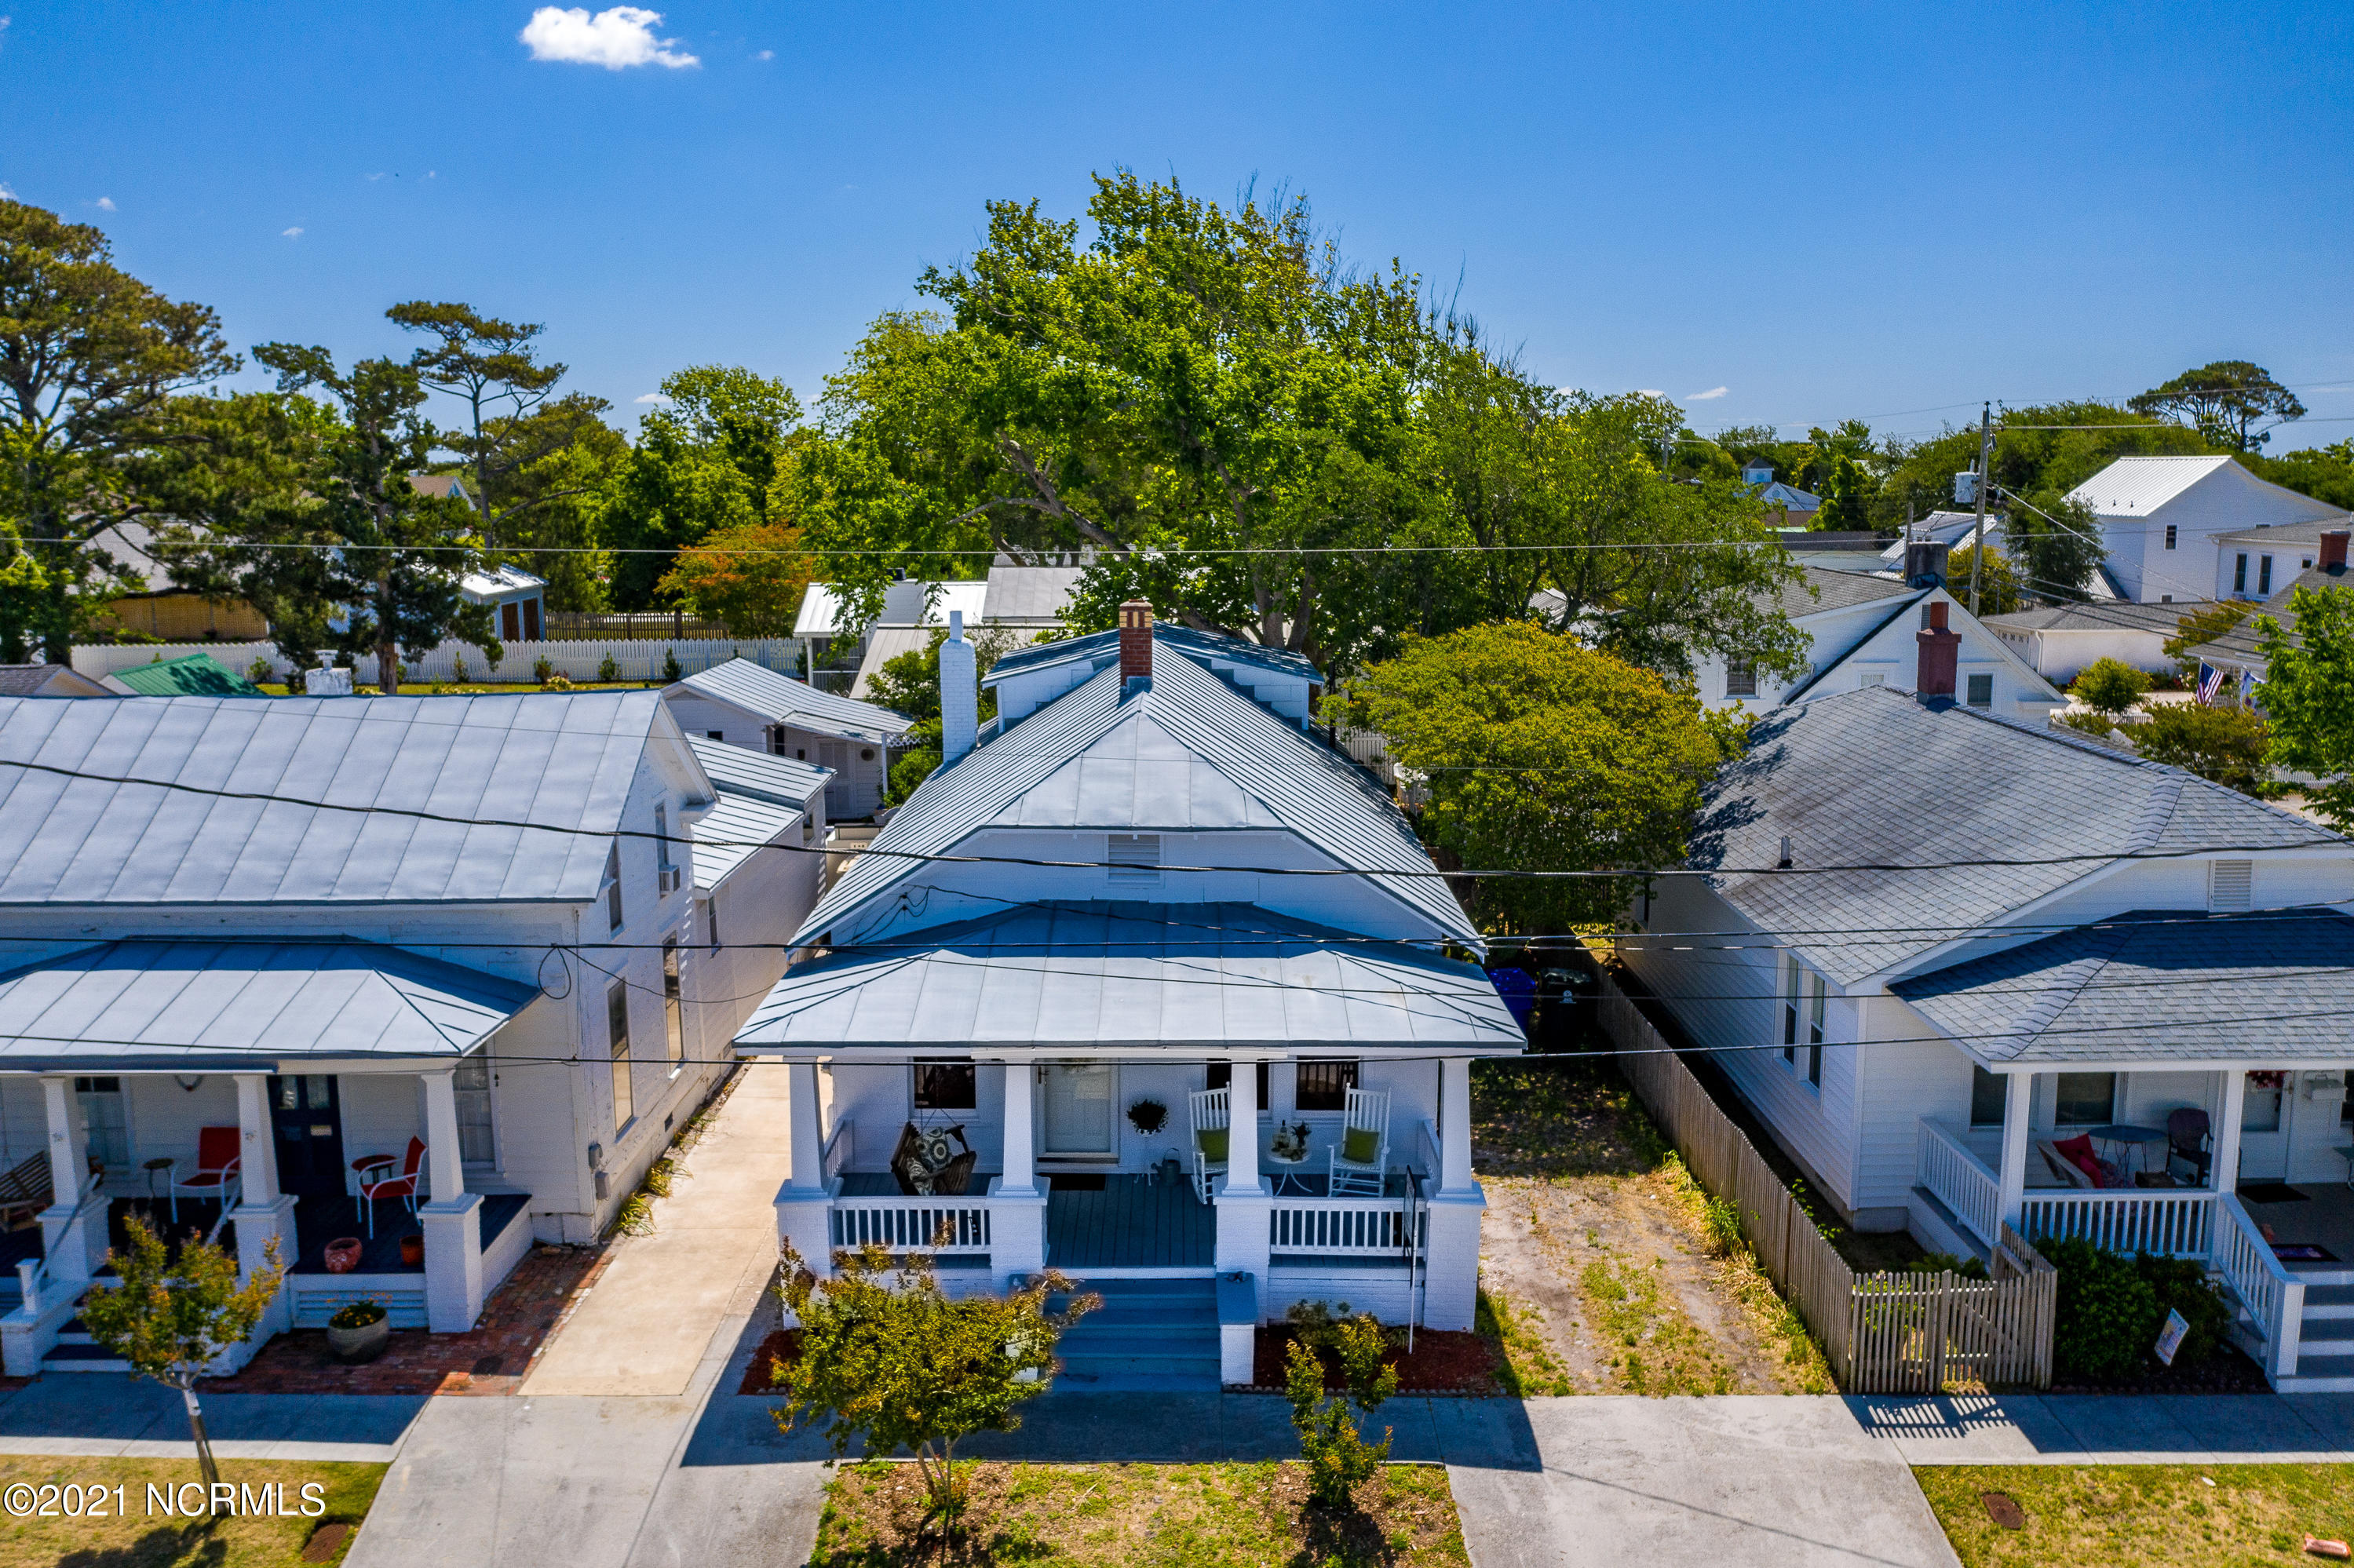 202 Gordon Street, Beaufort, North Carolina 28516, 2 Bedrooms Bedrooms, 6 Rooms Rooms,1 BathroomBathrooms,Single family residence,For sale,Gordon,100263203